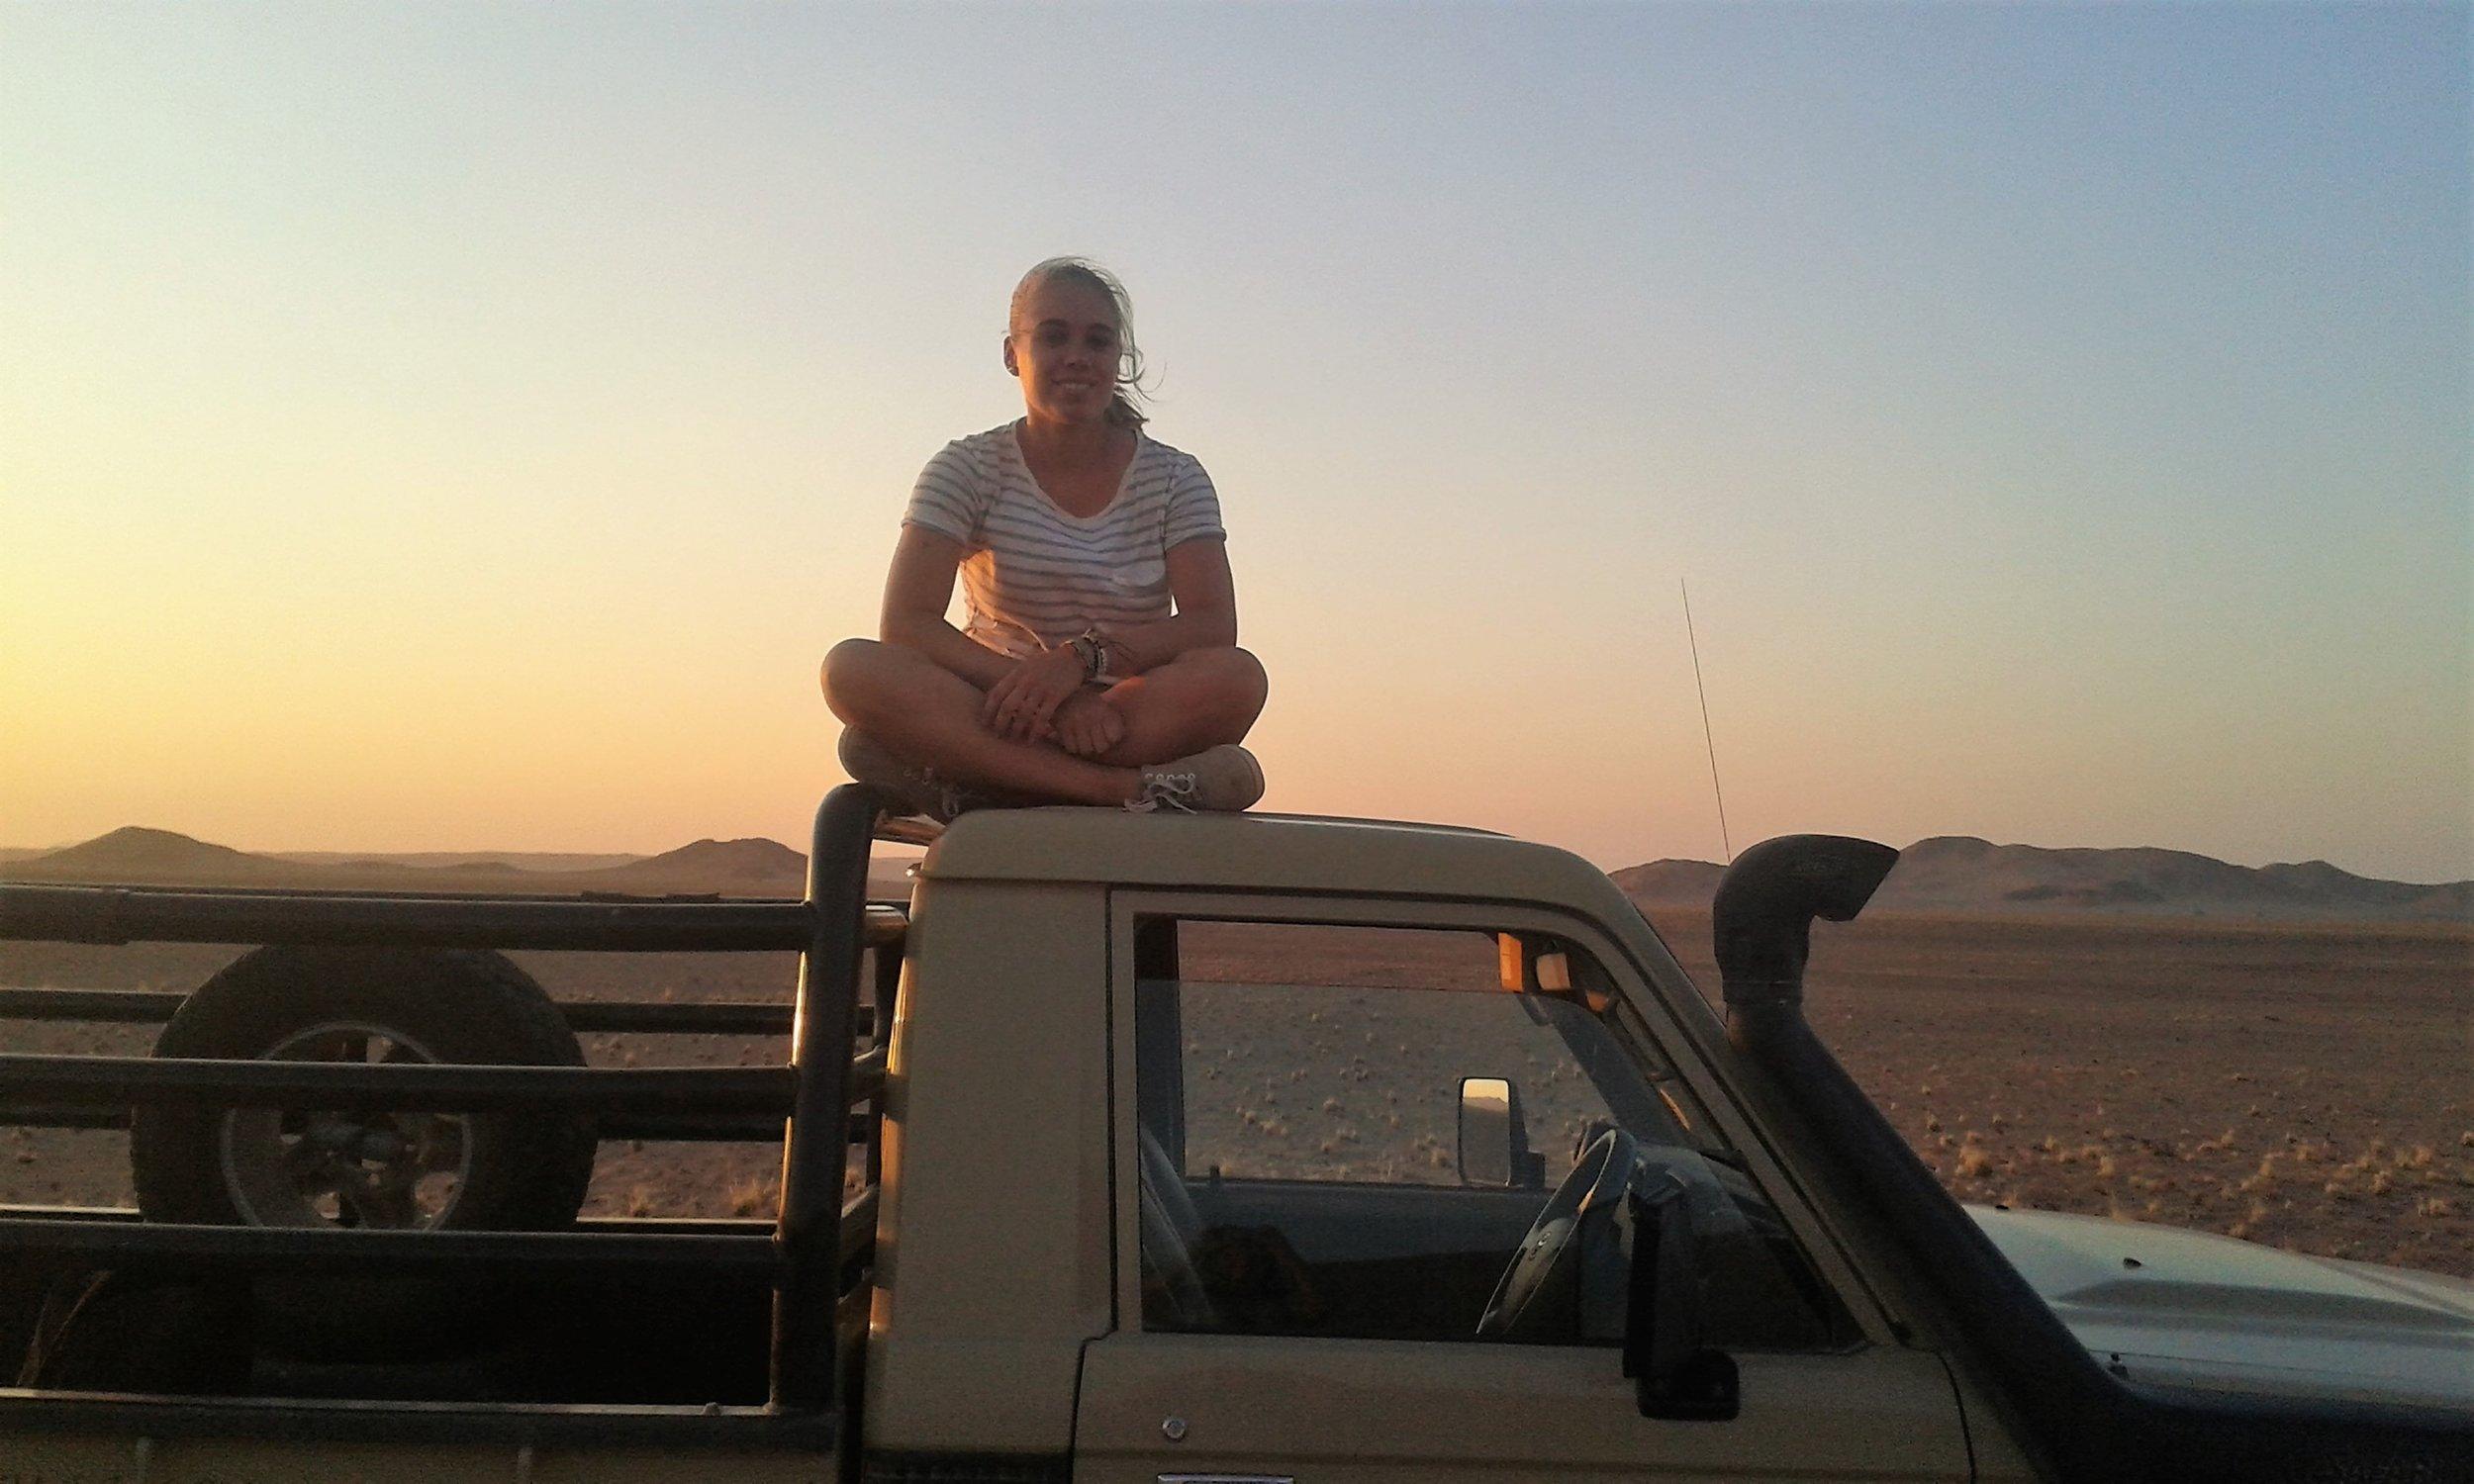 Namibia-Jeep-Sitzenaufdemdach.jpg